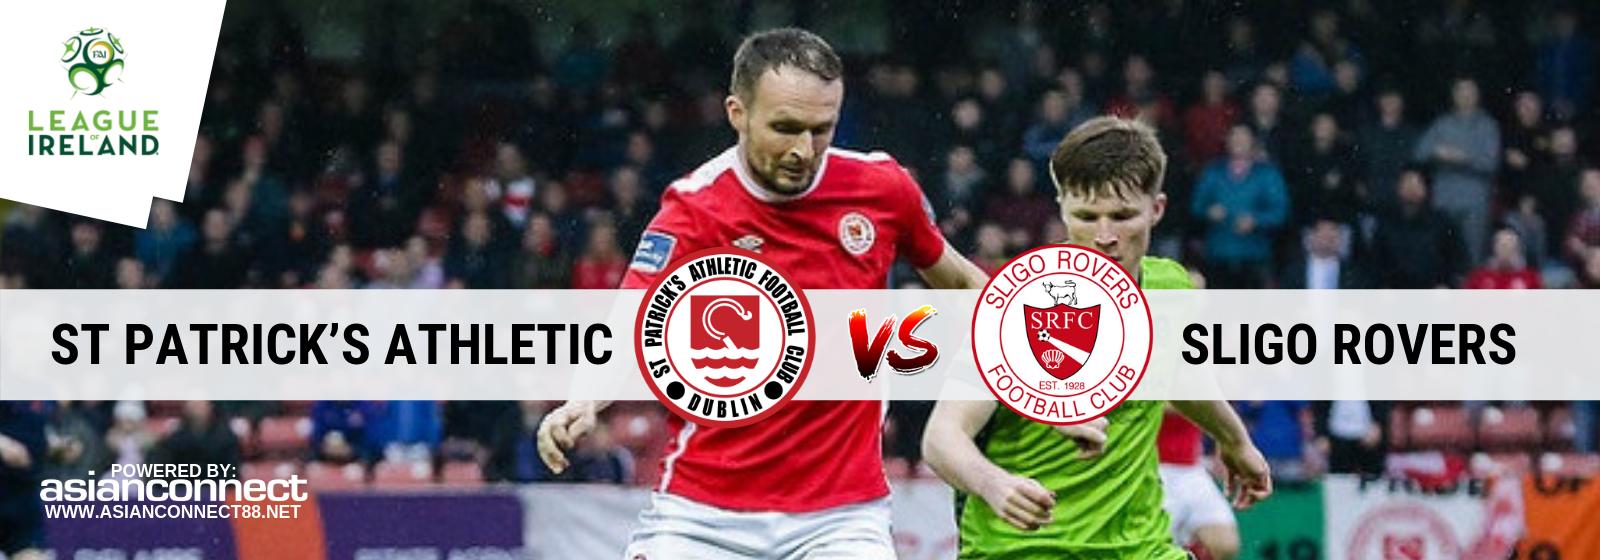 St Patrick's Athletic vs Sligo Rovers Asianconnect